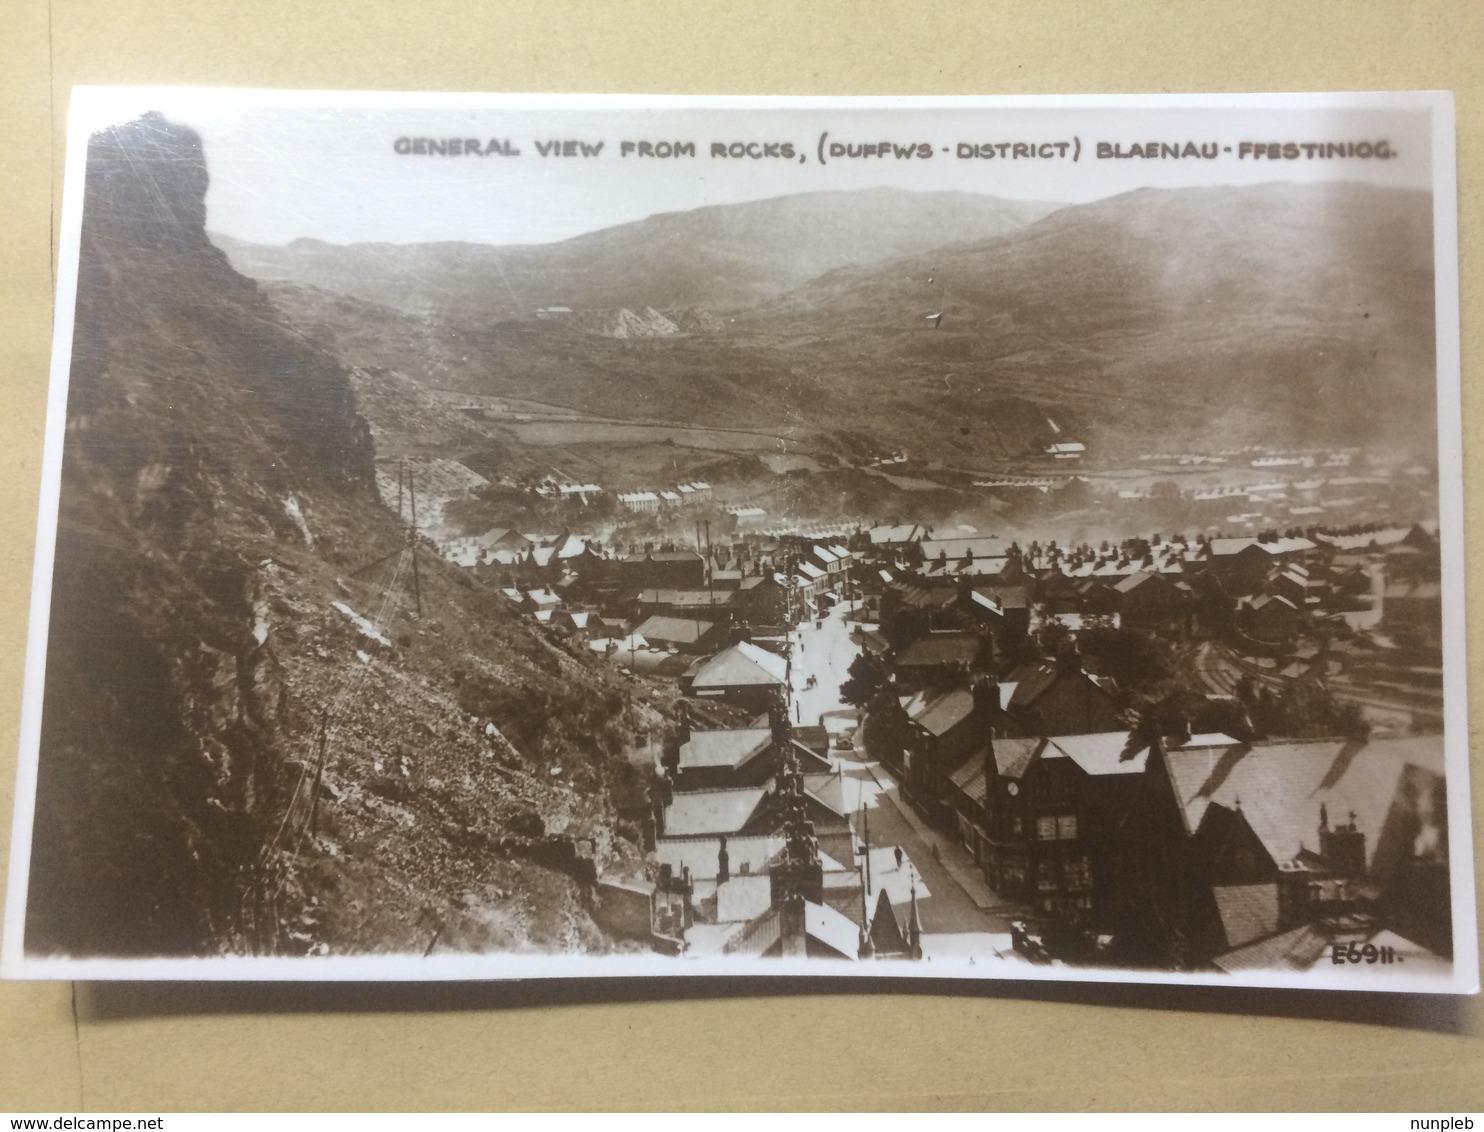 UK - Blaenau-Ffestniog - General View From Rocks - Grosvenor E6911 - Merionethshire